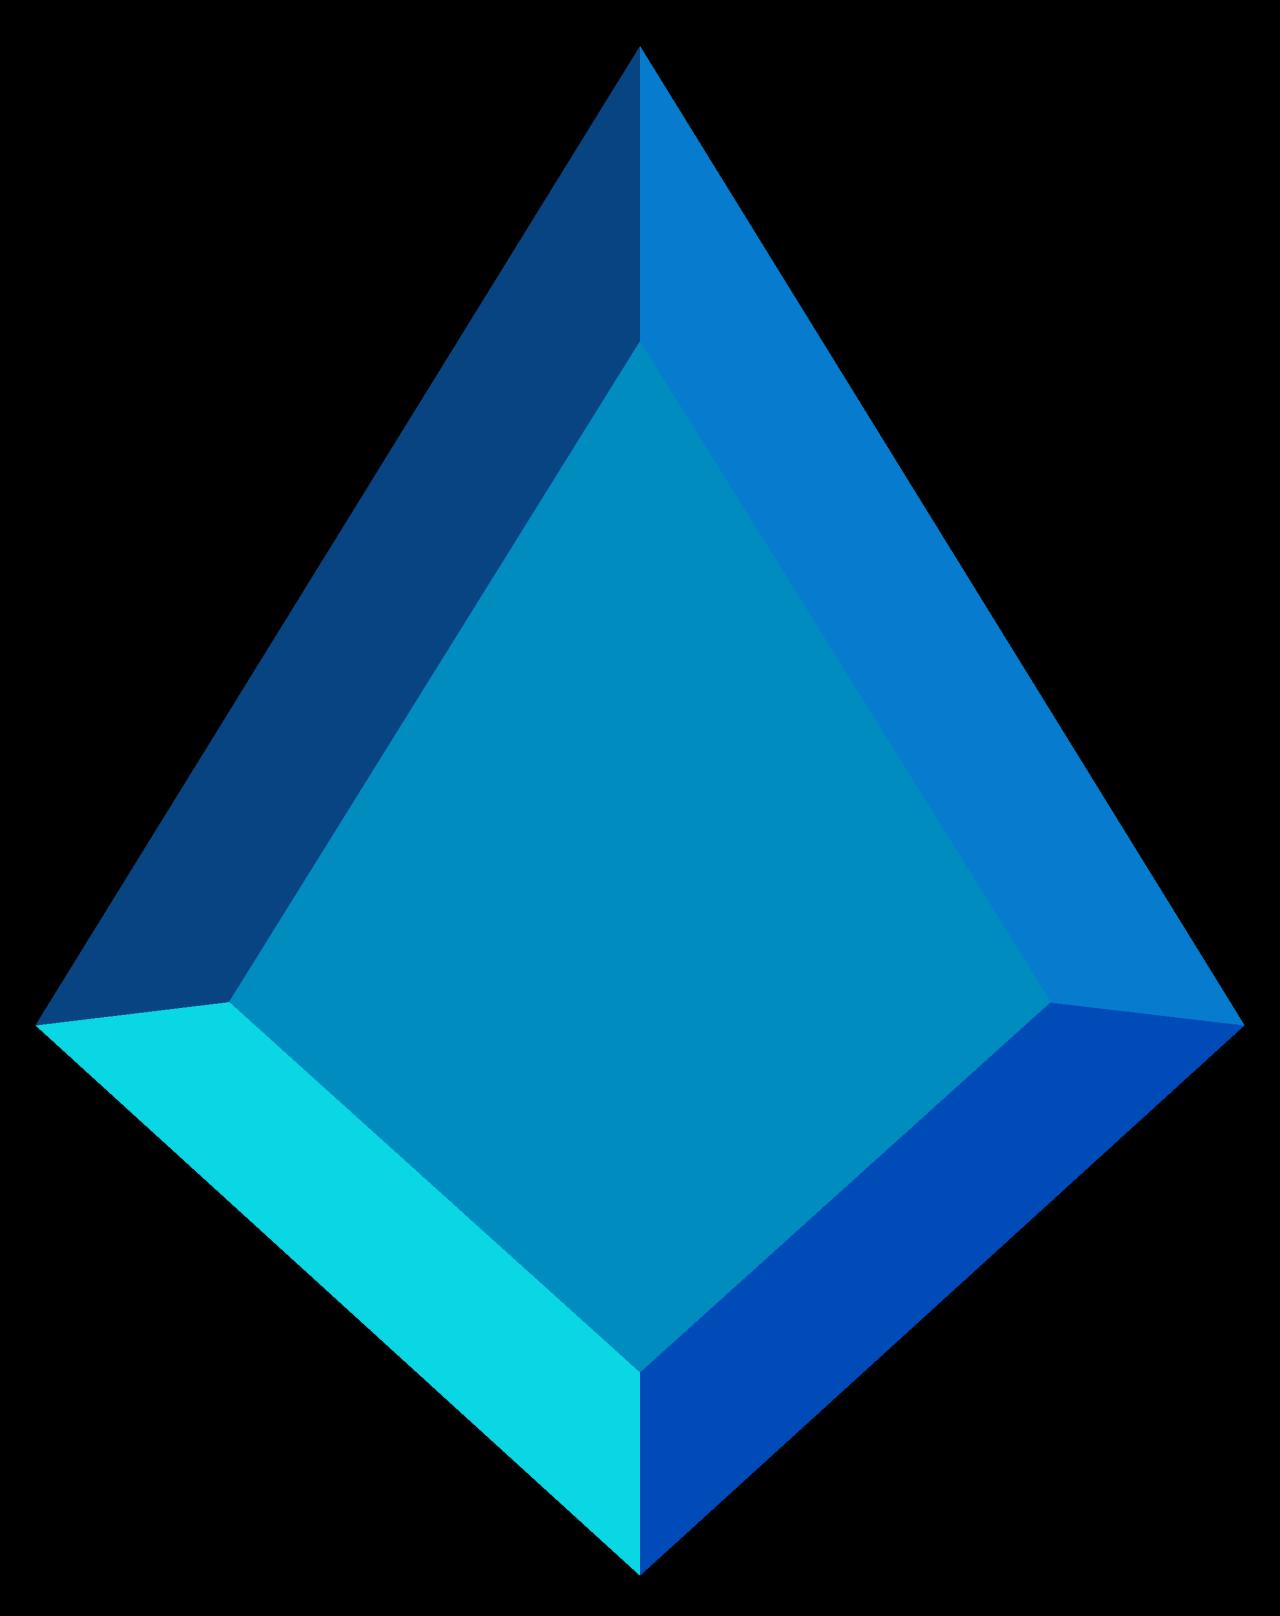 Diamond clipart pile diamond. Free clip art gem